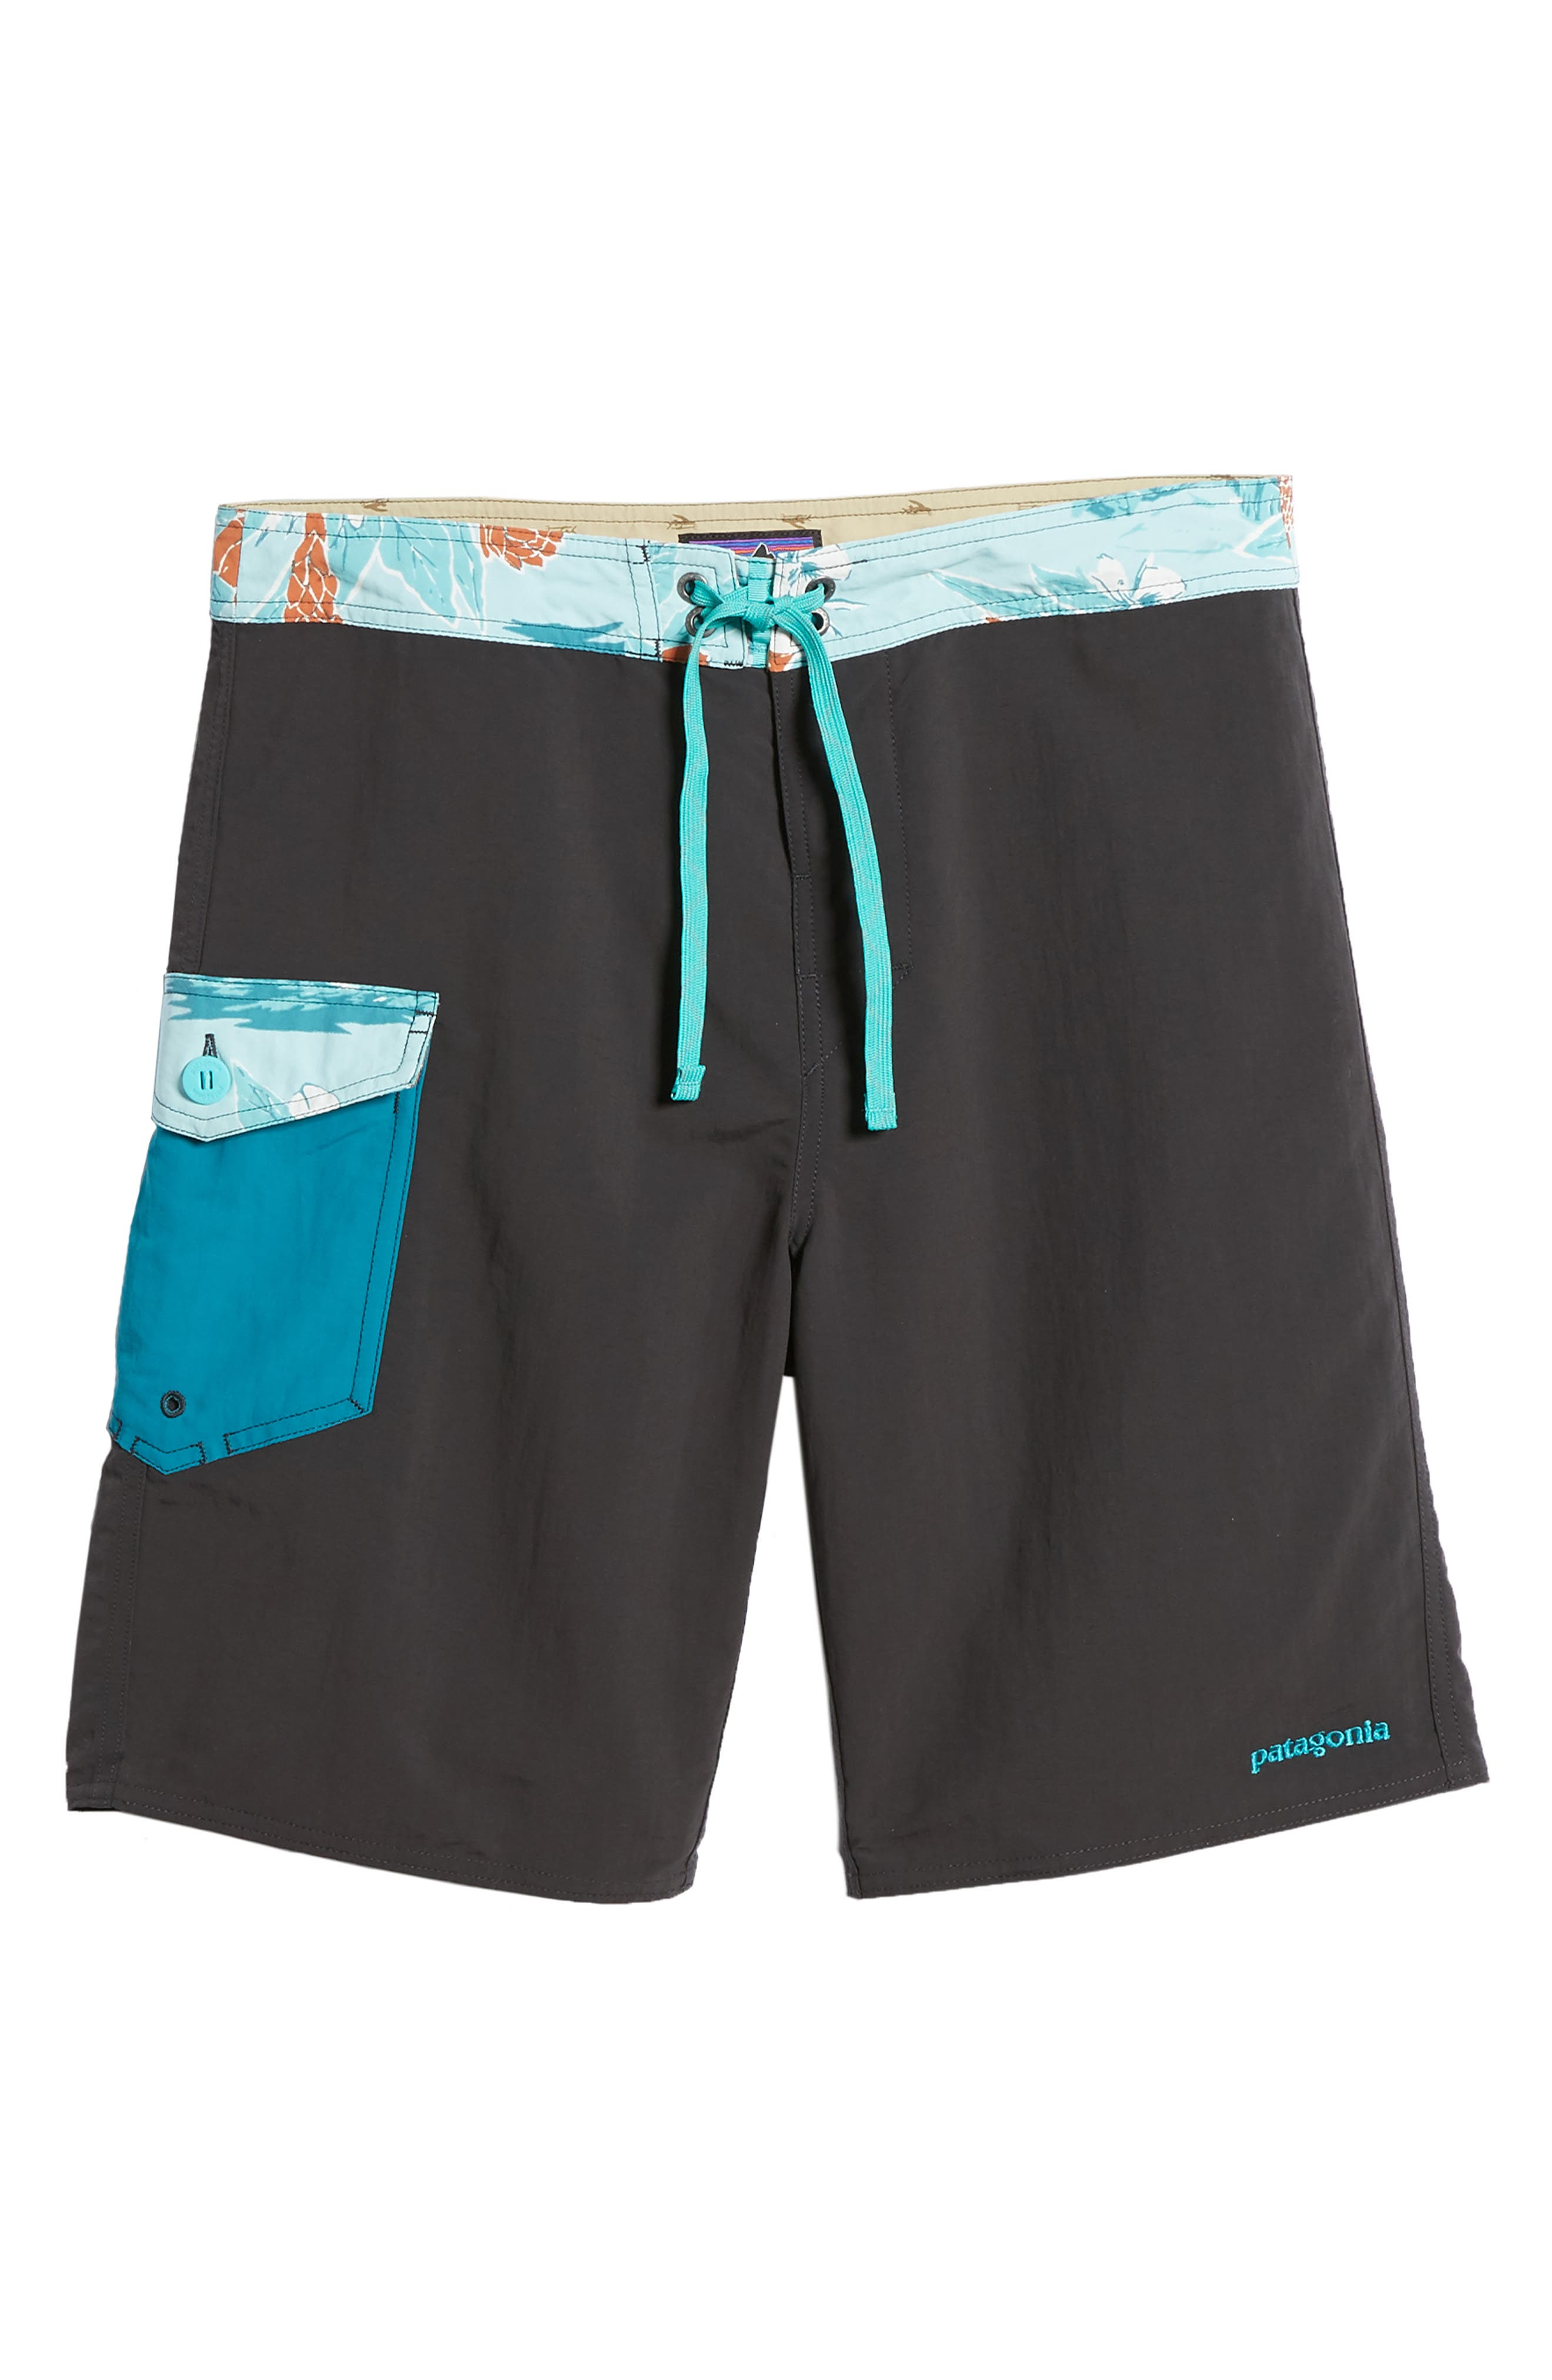 Wavefarer Board Shorts,                             Alternate thumbnail 6, color,                             001